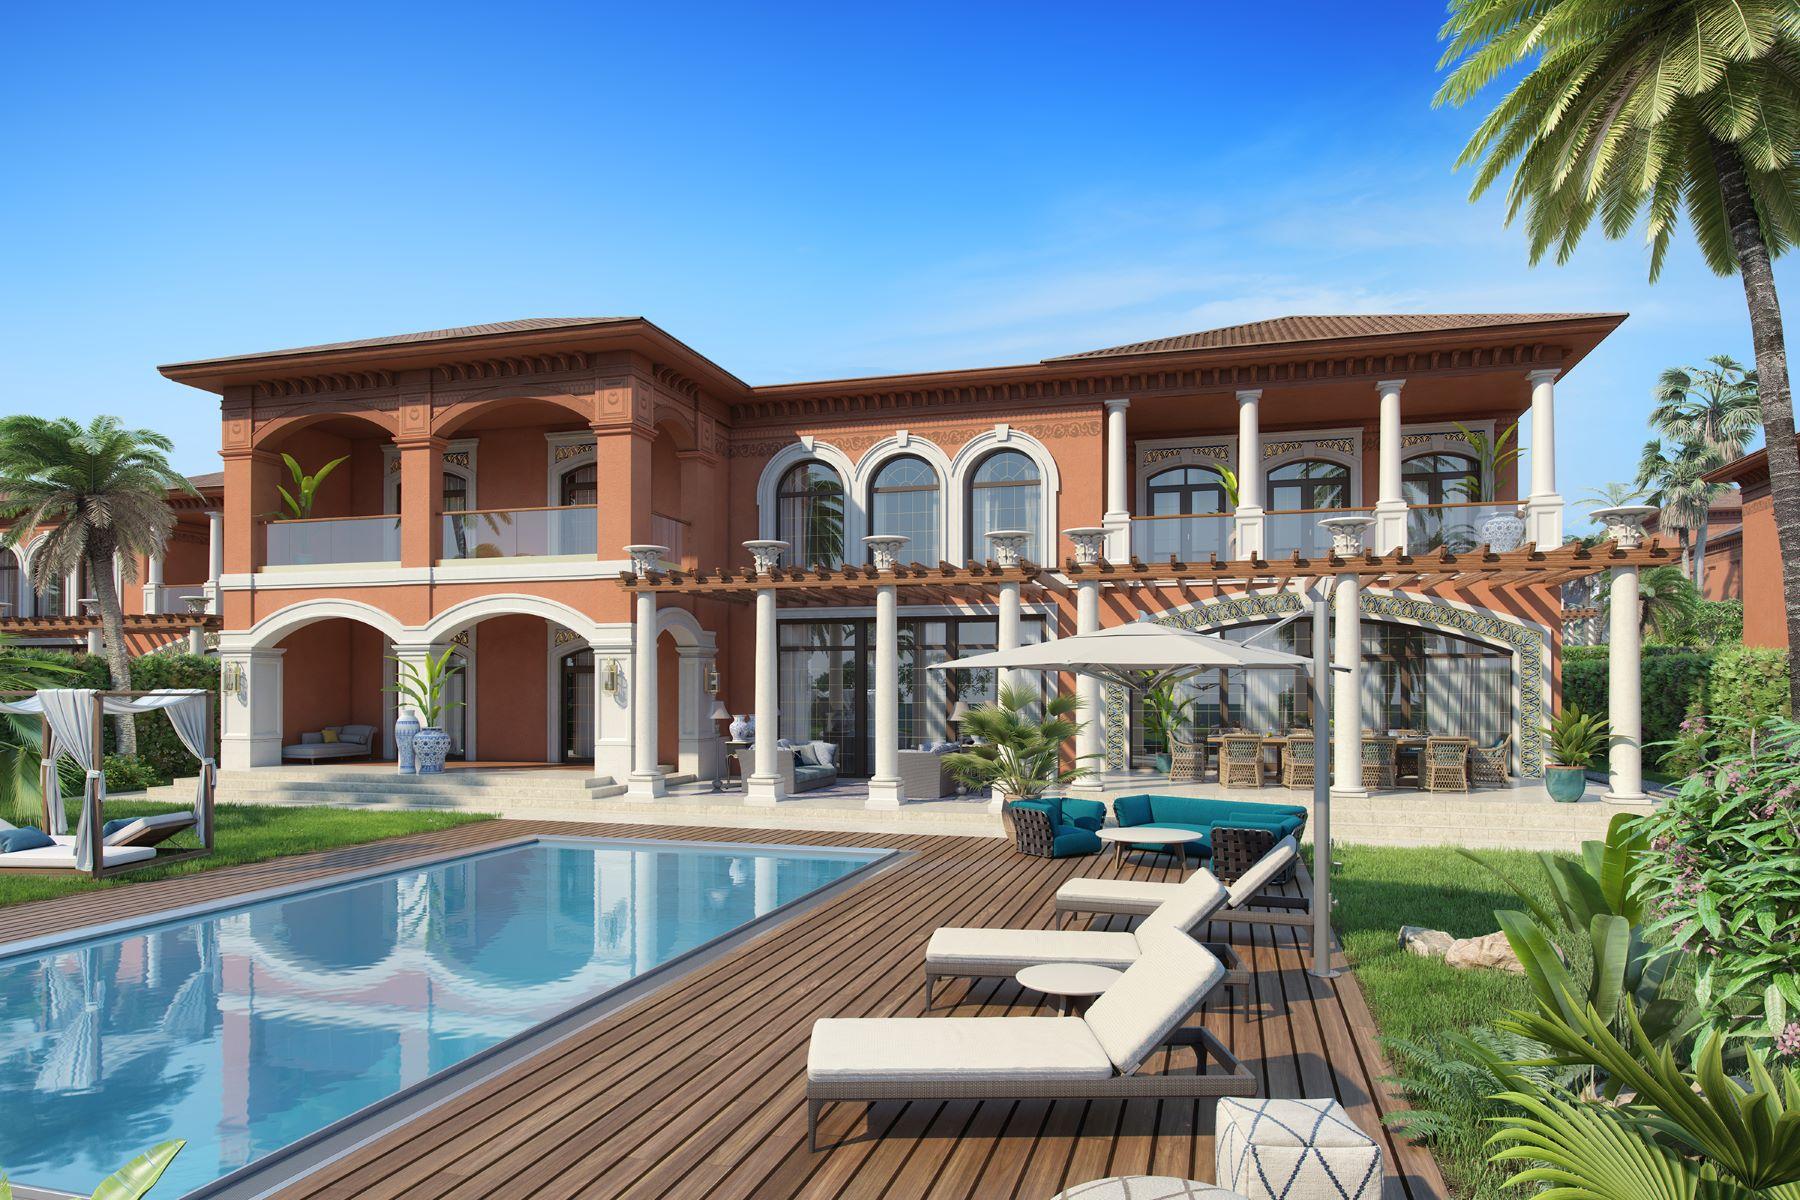 Other Residential for Sale at XXII Carat on Palm Jumeirah, Dubai Dubai, United Arab Emirates